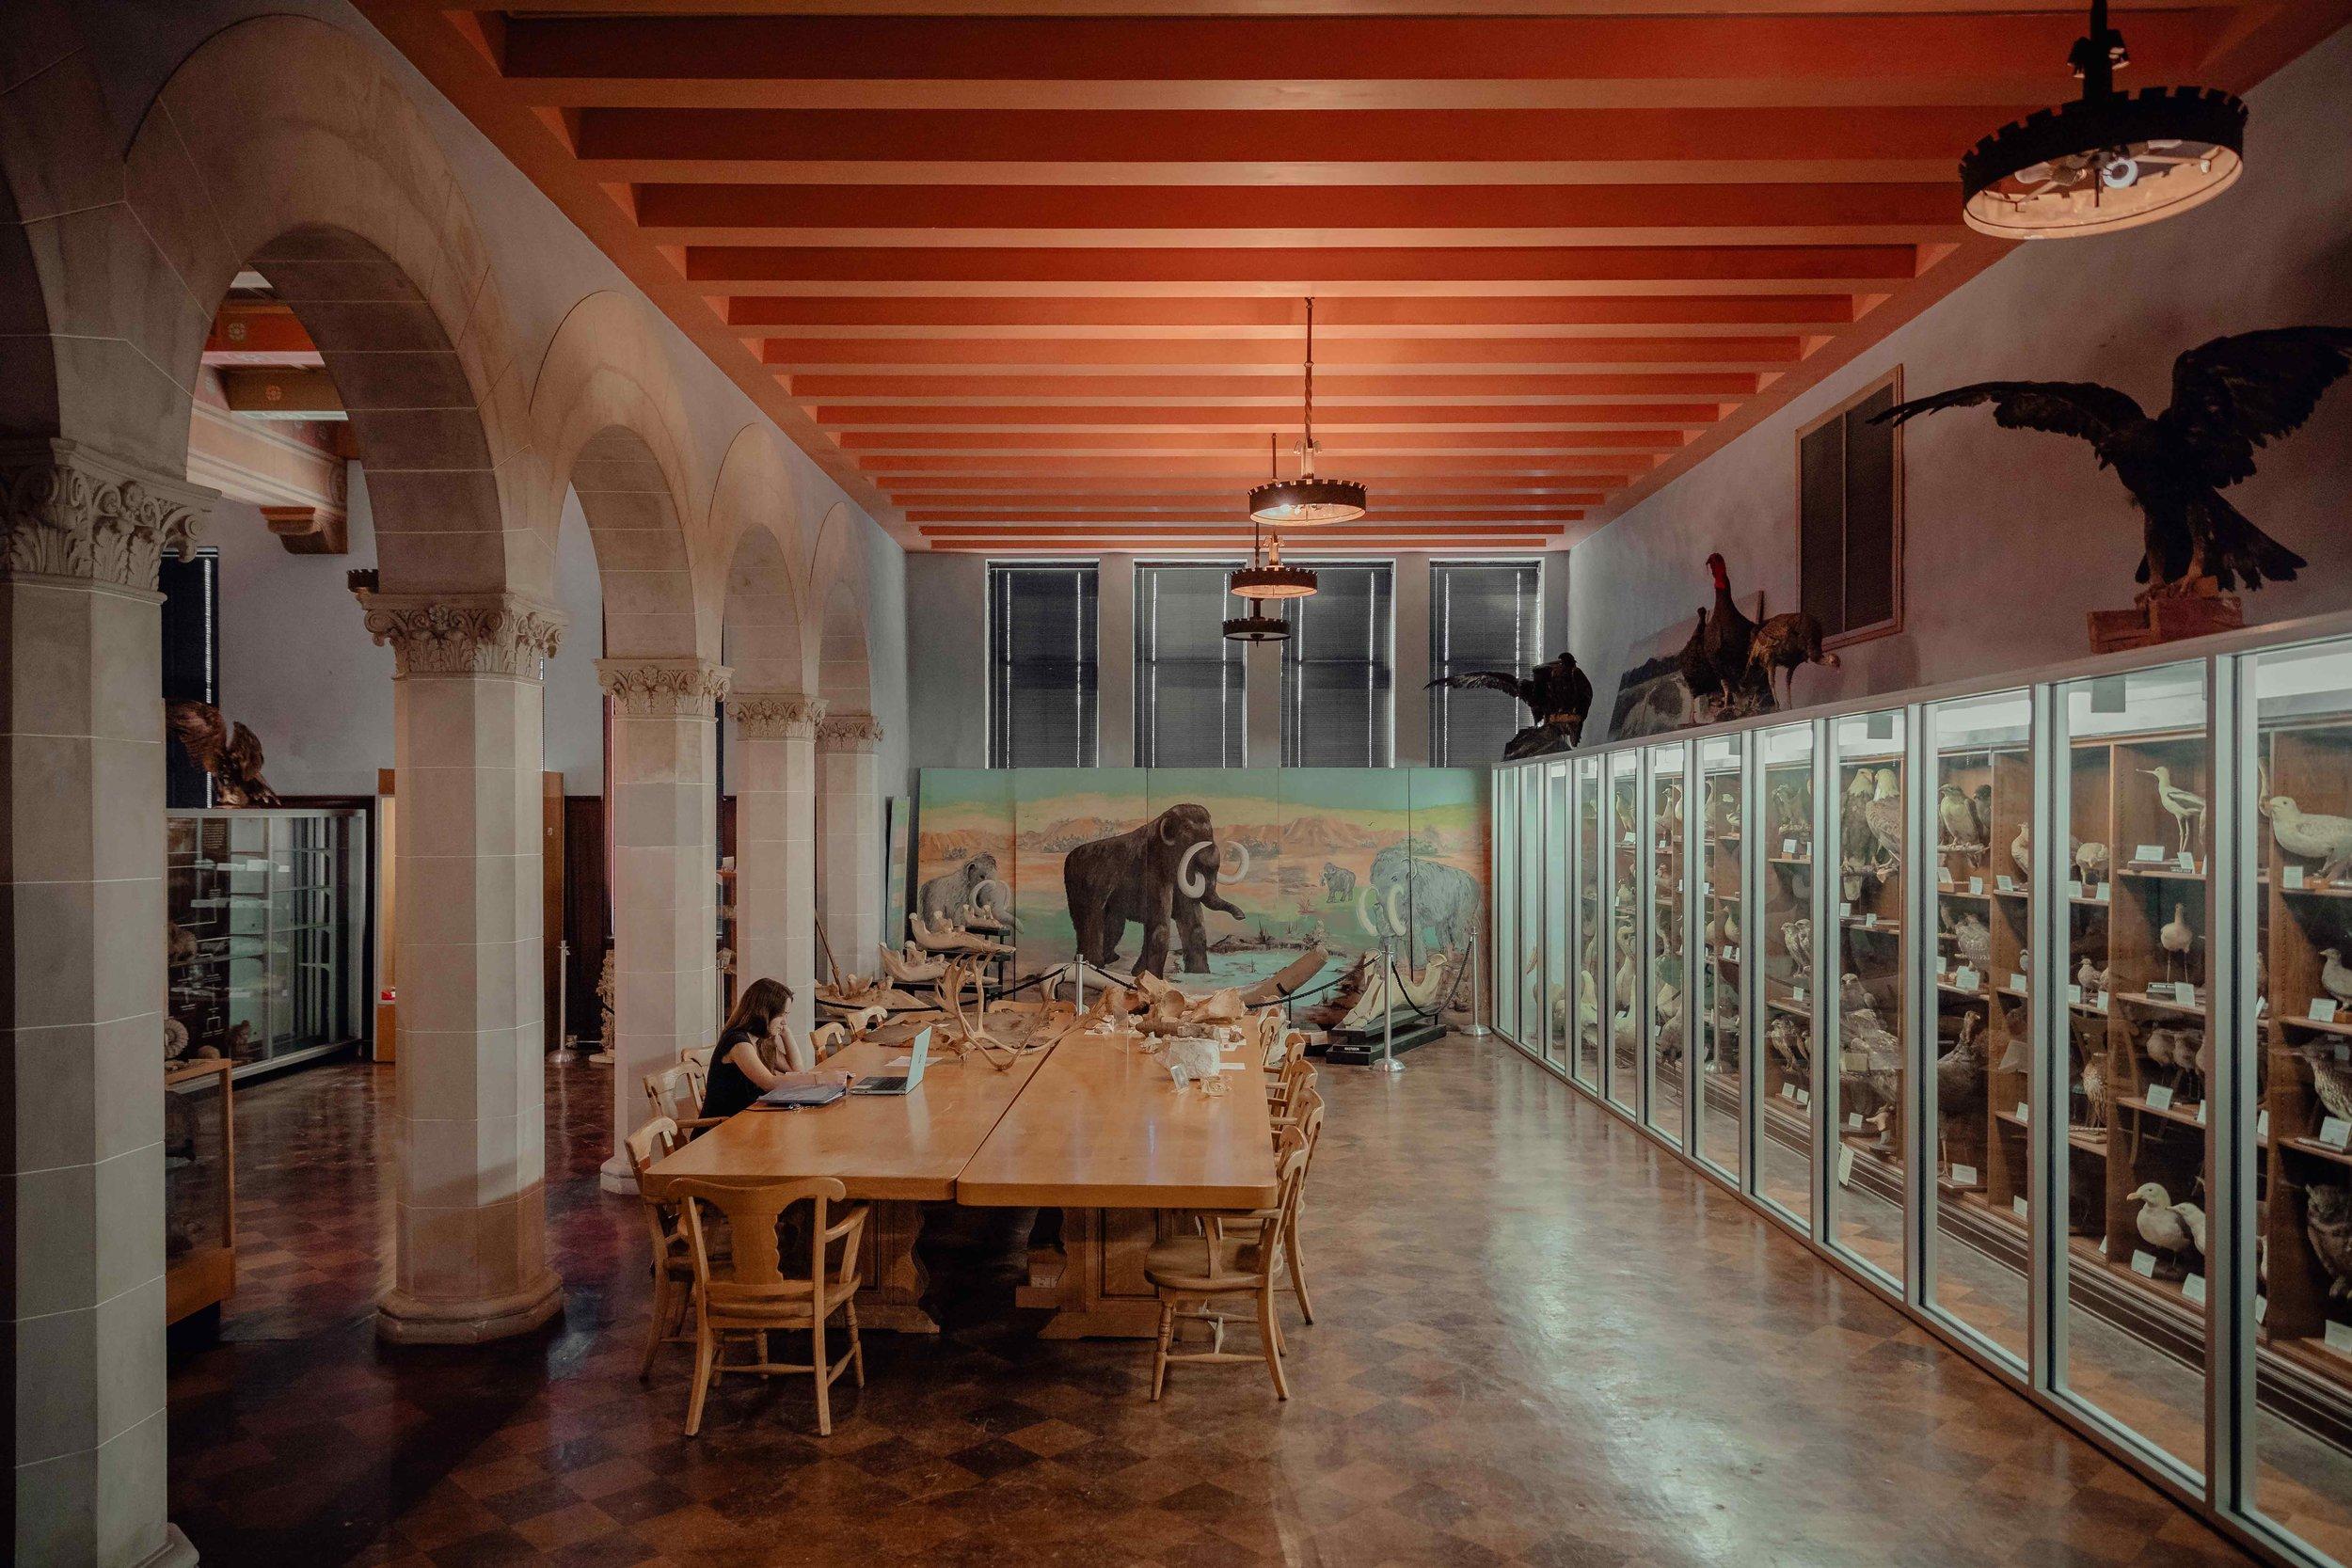 HighFiveMedia_MuseumofNaturalHistory_NWOSU.jpg